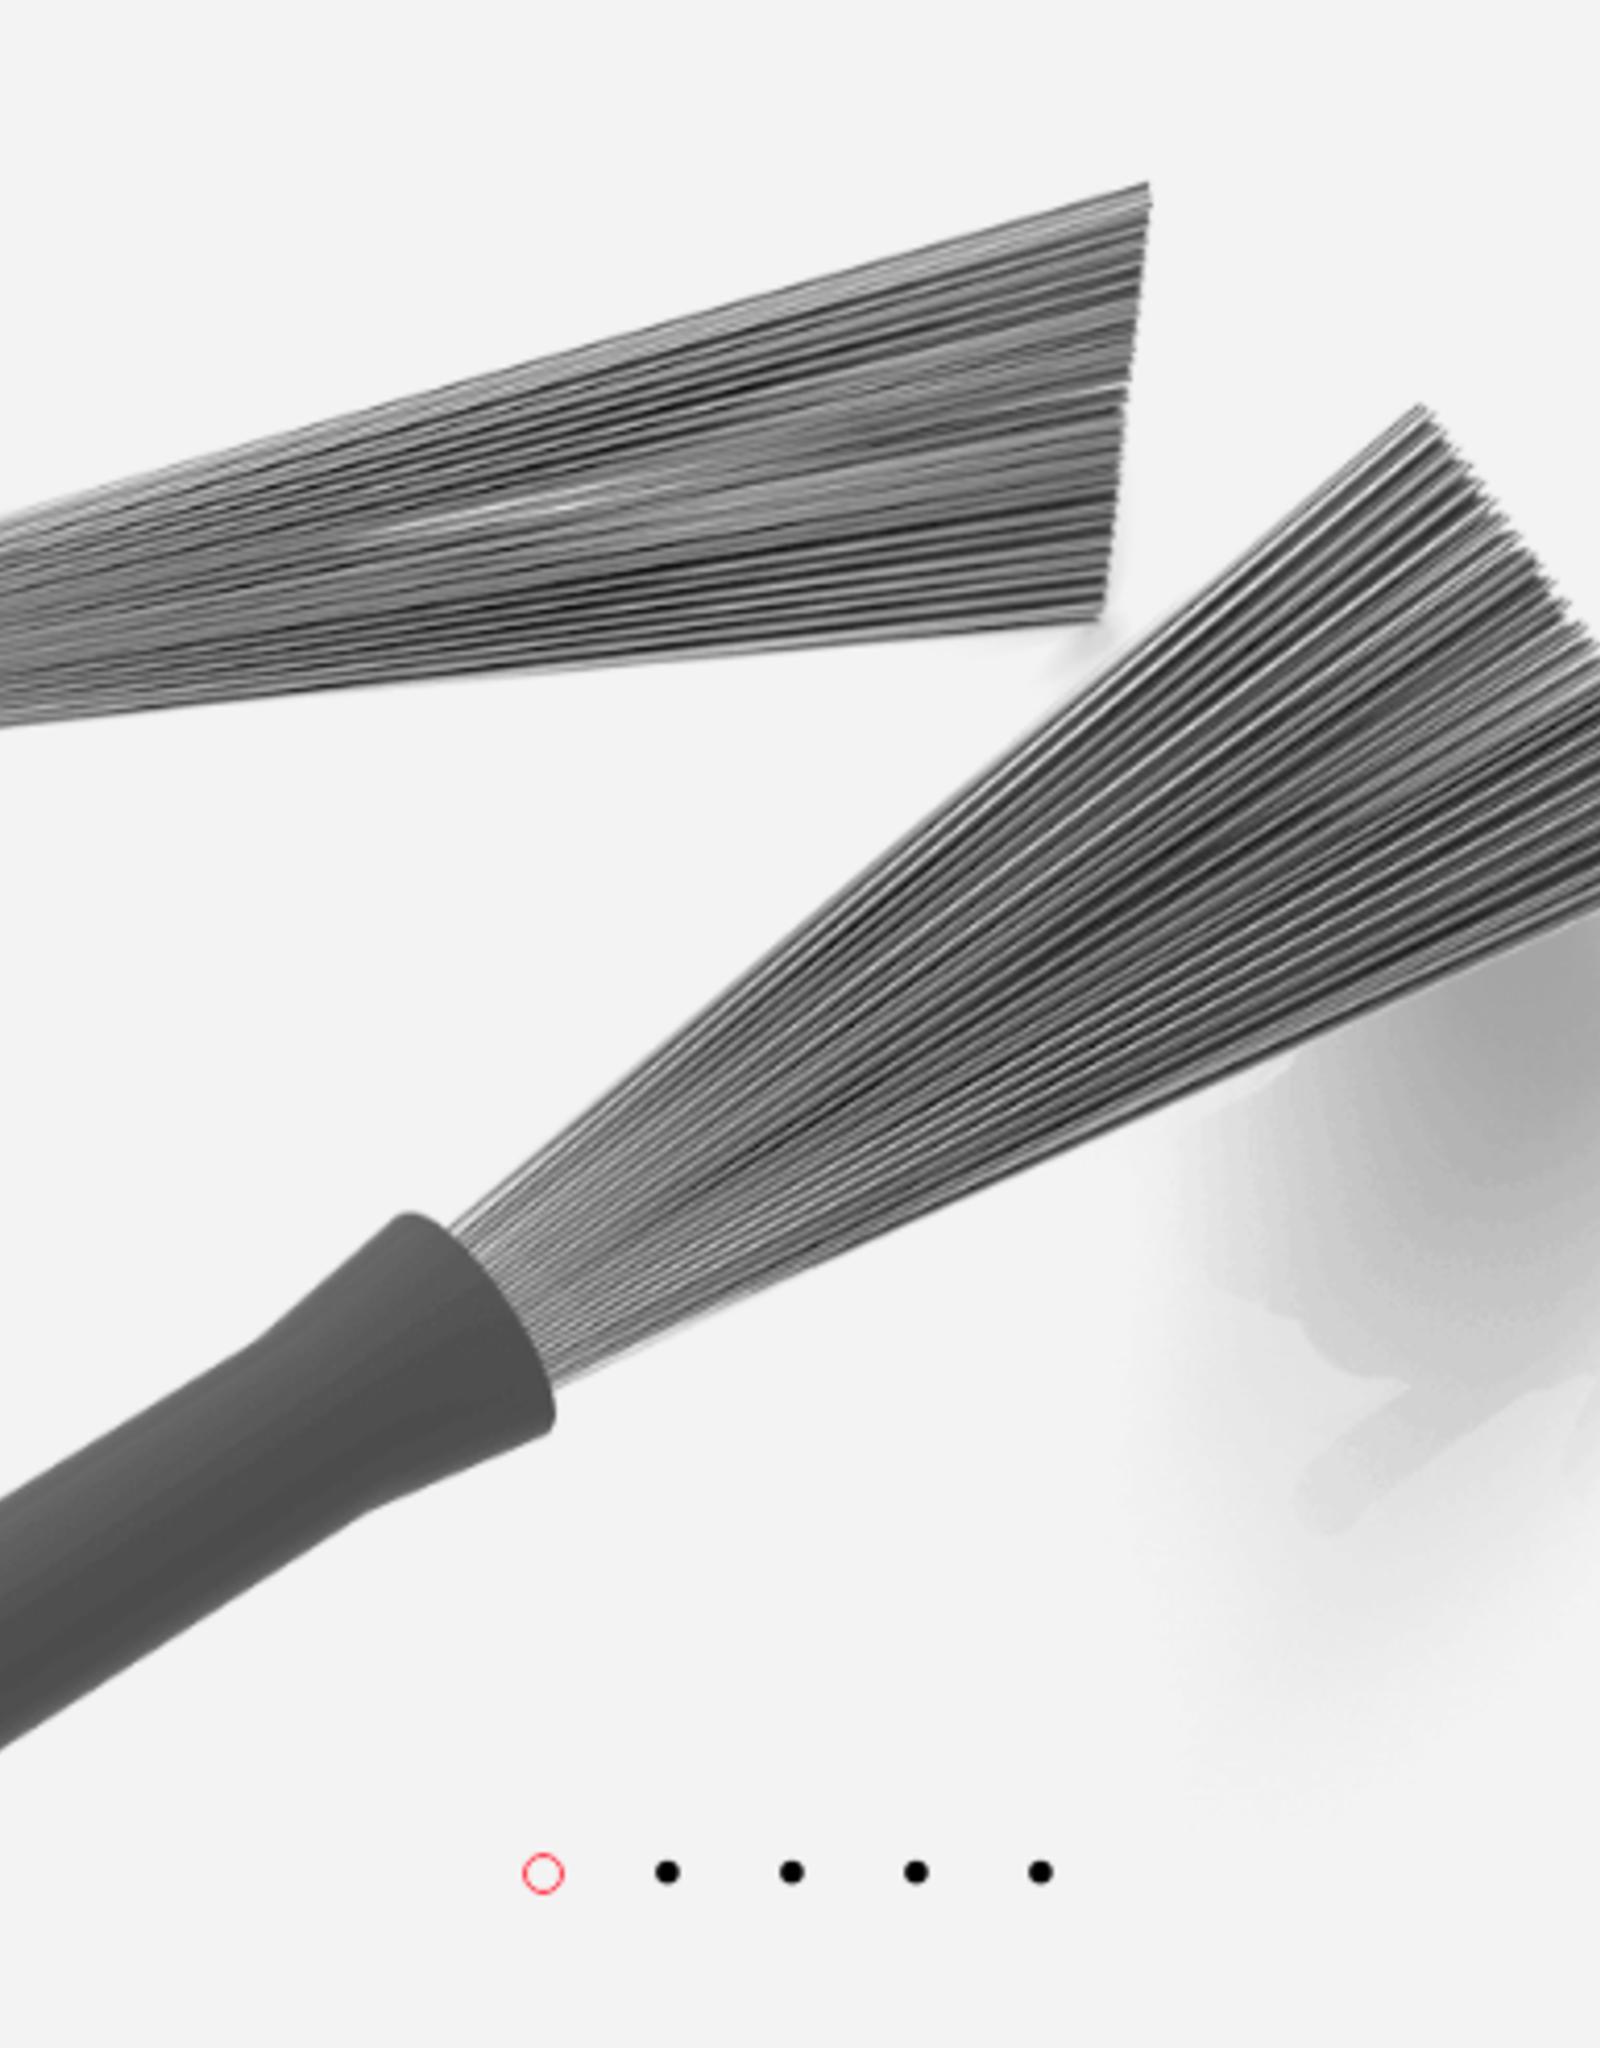 Promark Promark TB4 Telescoping Wire Brush